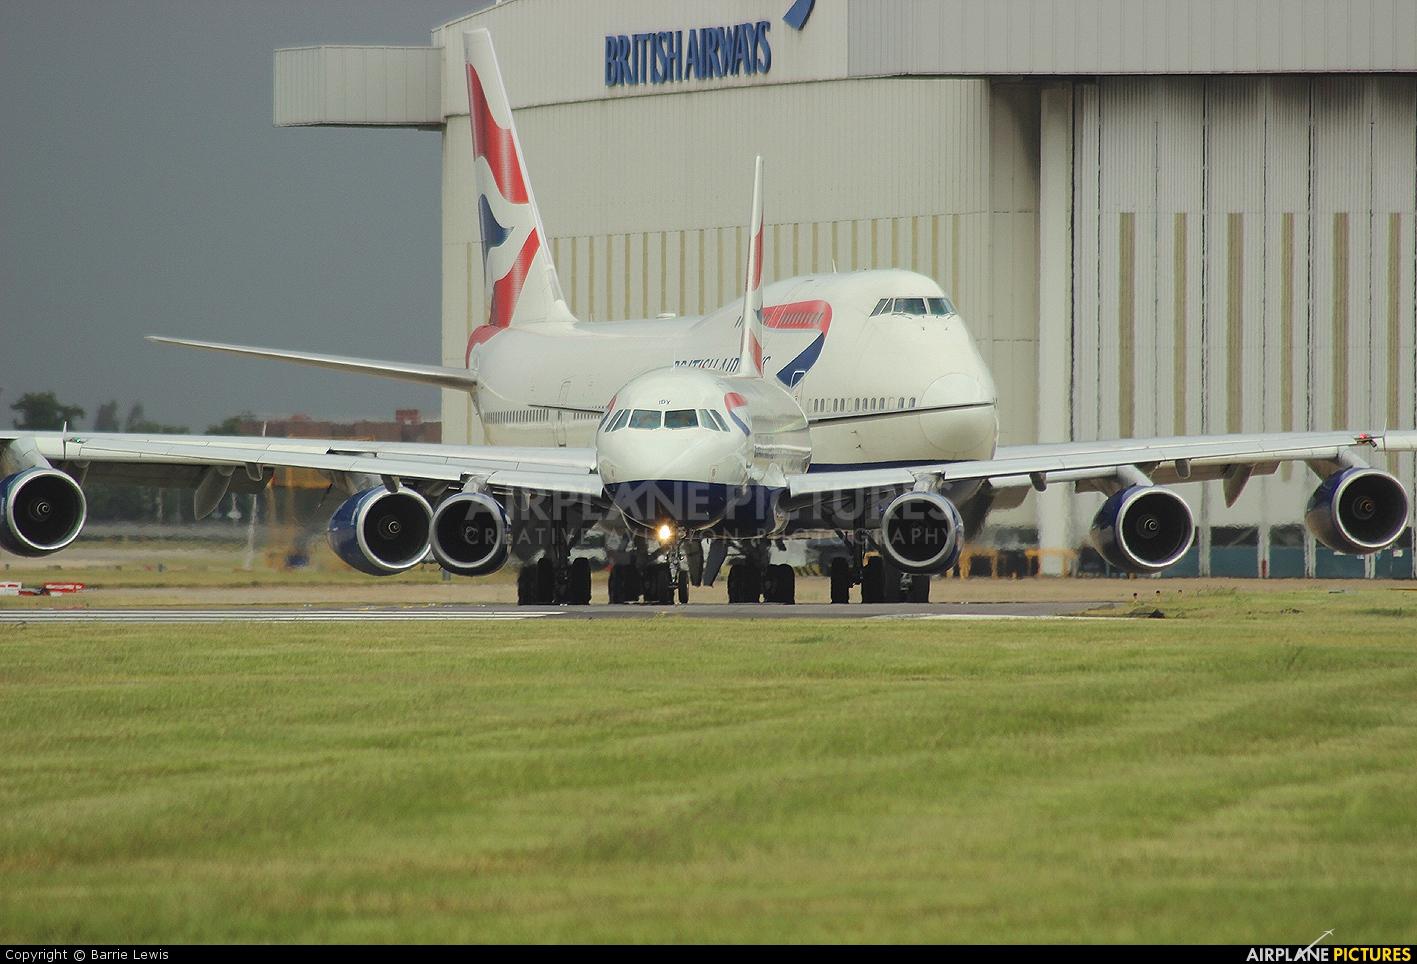 British Airways G-MIDY aircraft at London - Heathrow